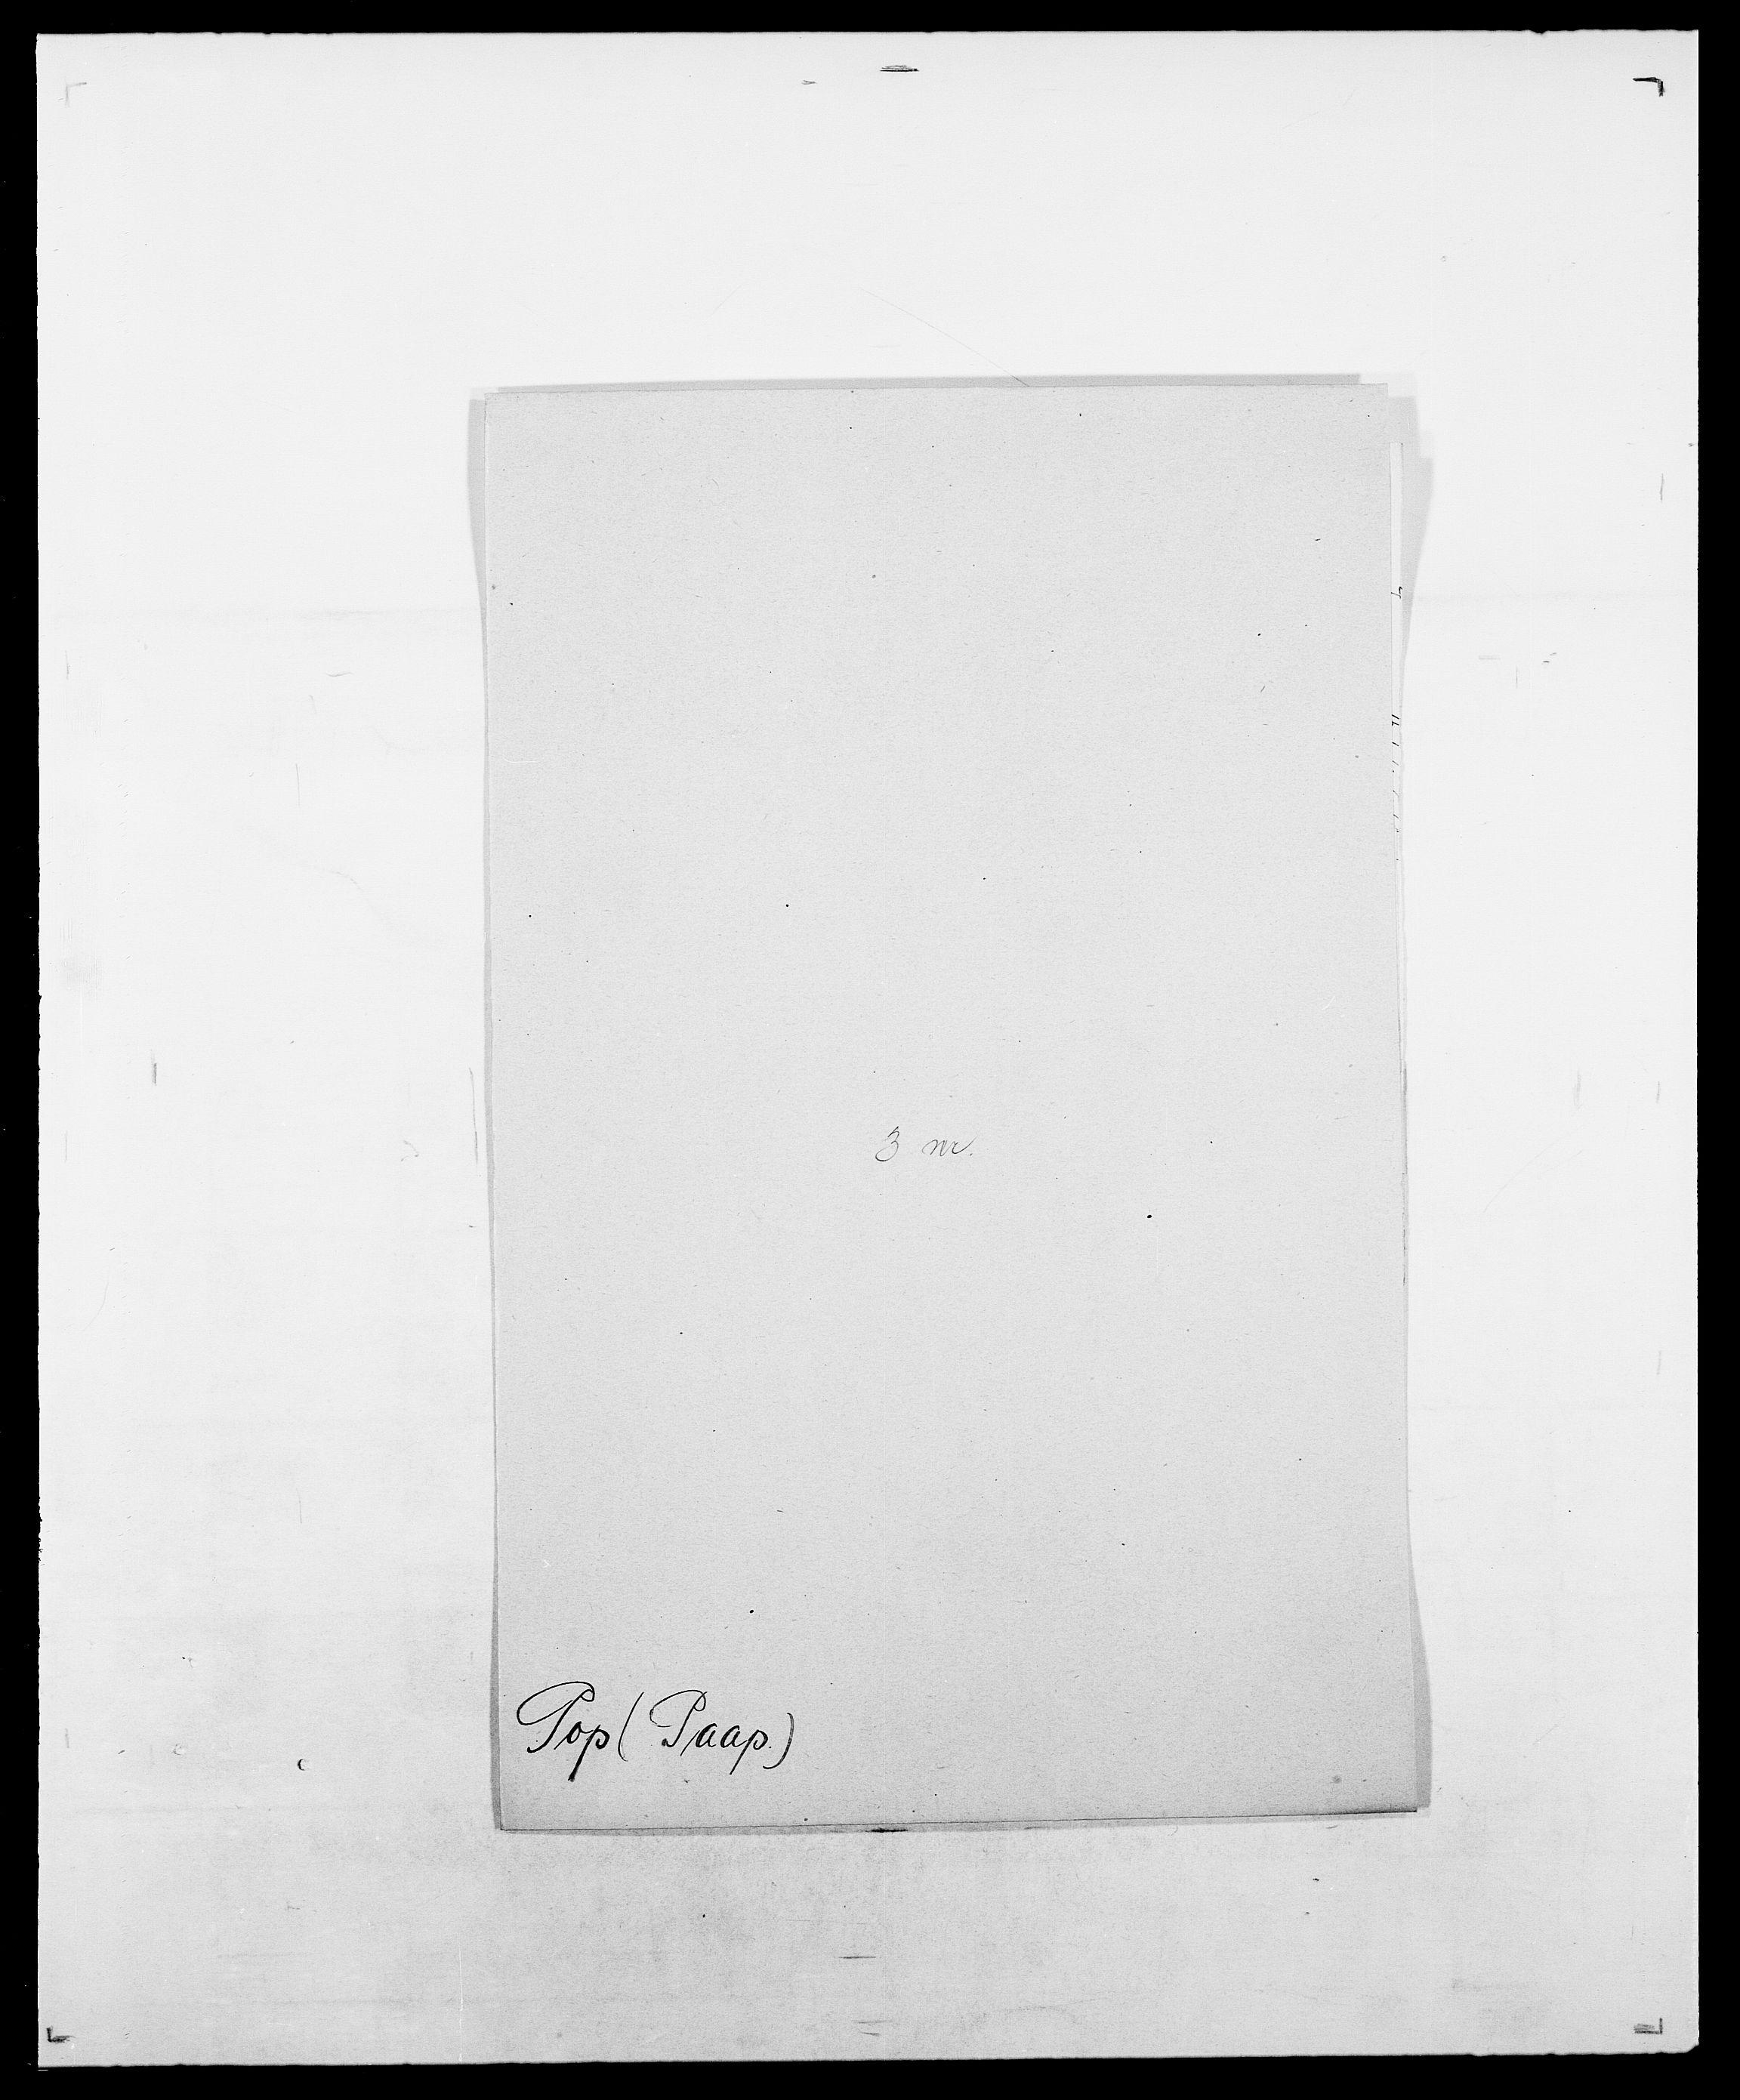 SAO, Delgobe, Charles Antoine - samling, D/Da/L0031: de Place - Raaum, s. 215